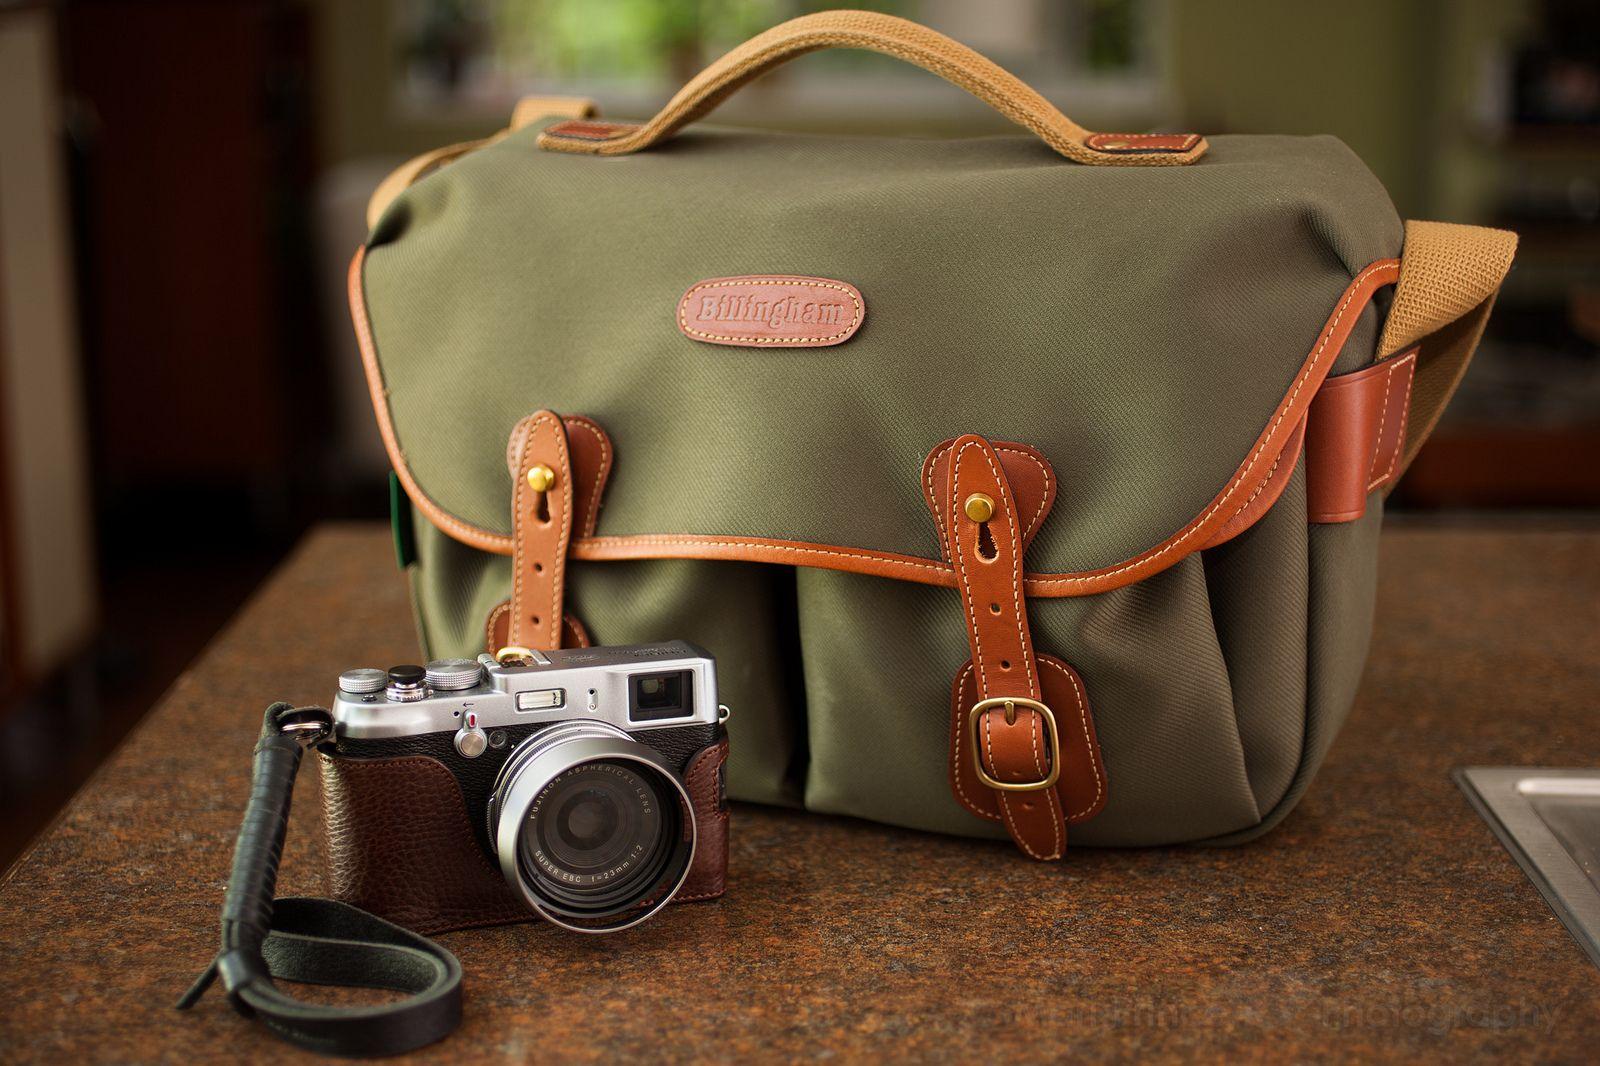 All Sizes Fuji X100 With Billingham Hadley Pro Bag Flickr Shoulder Khaki Chocolate Leather Photo Sharing